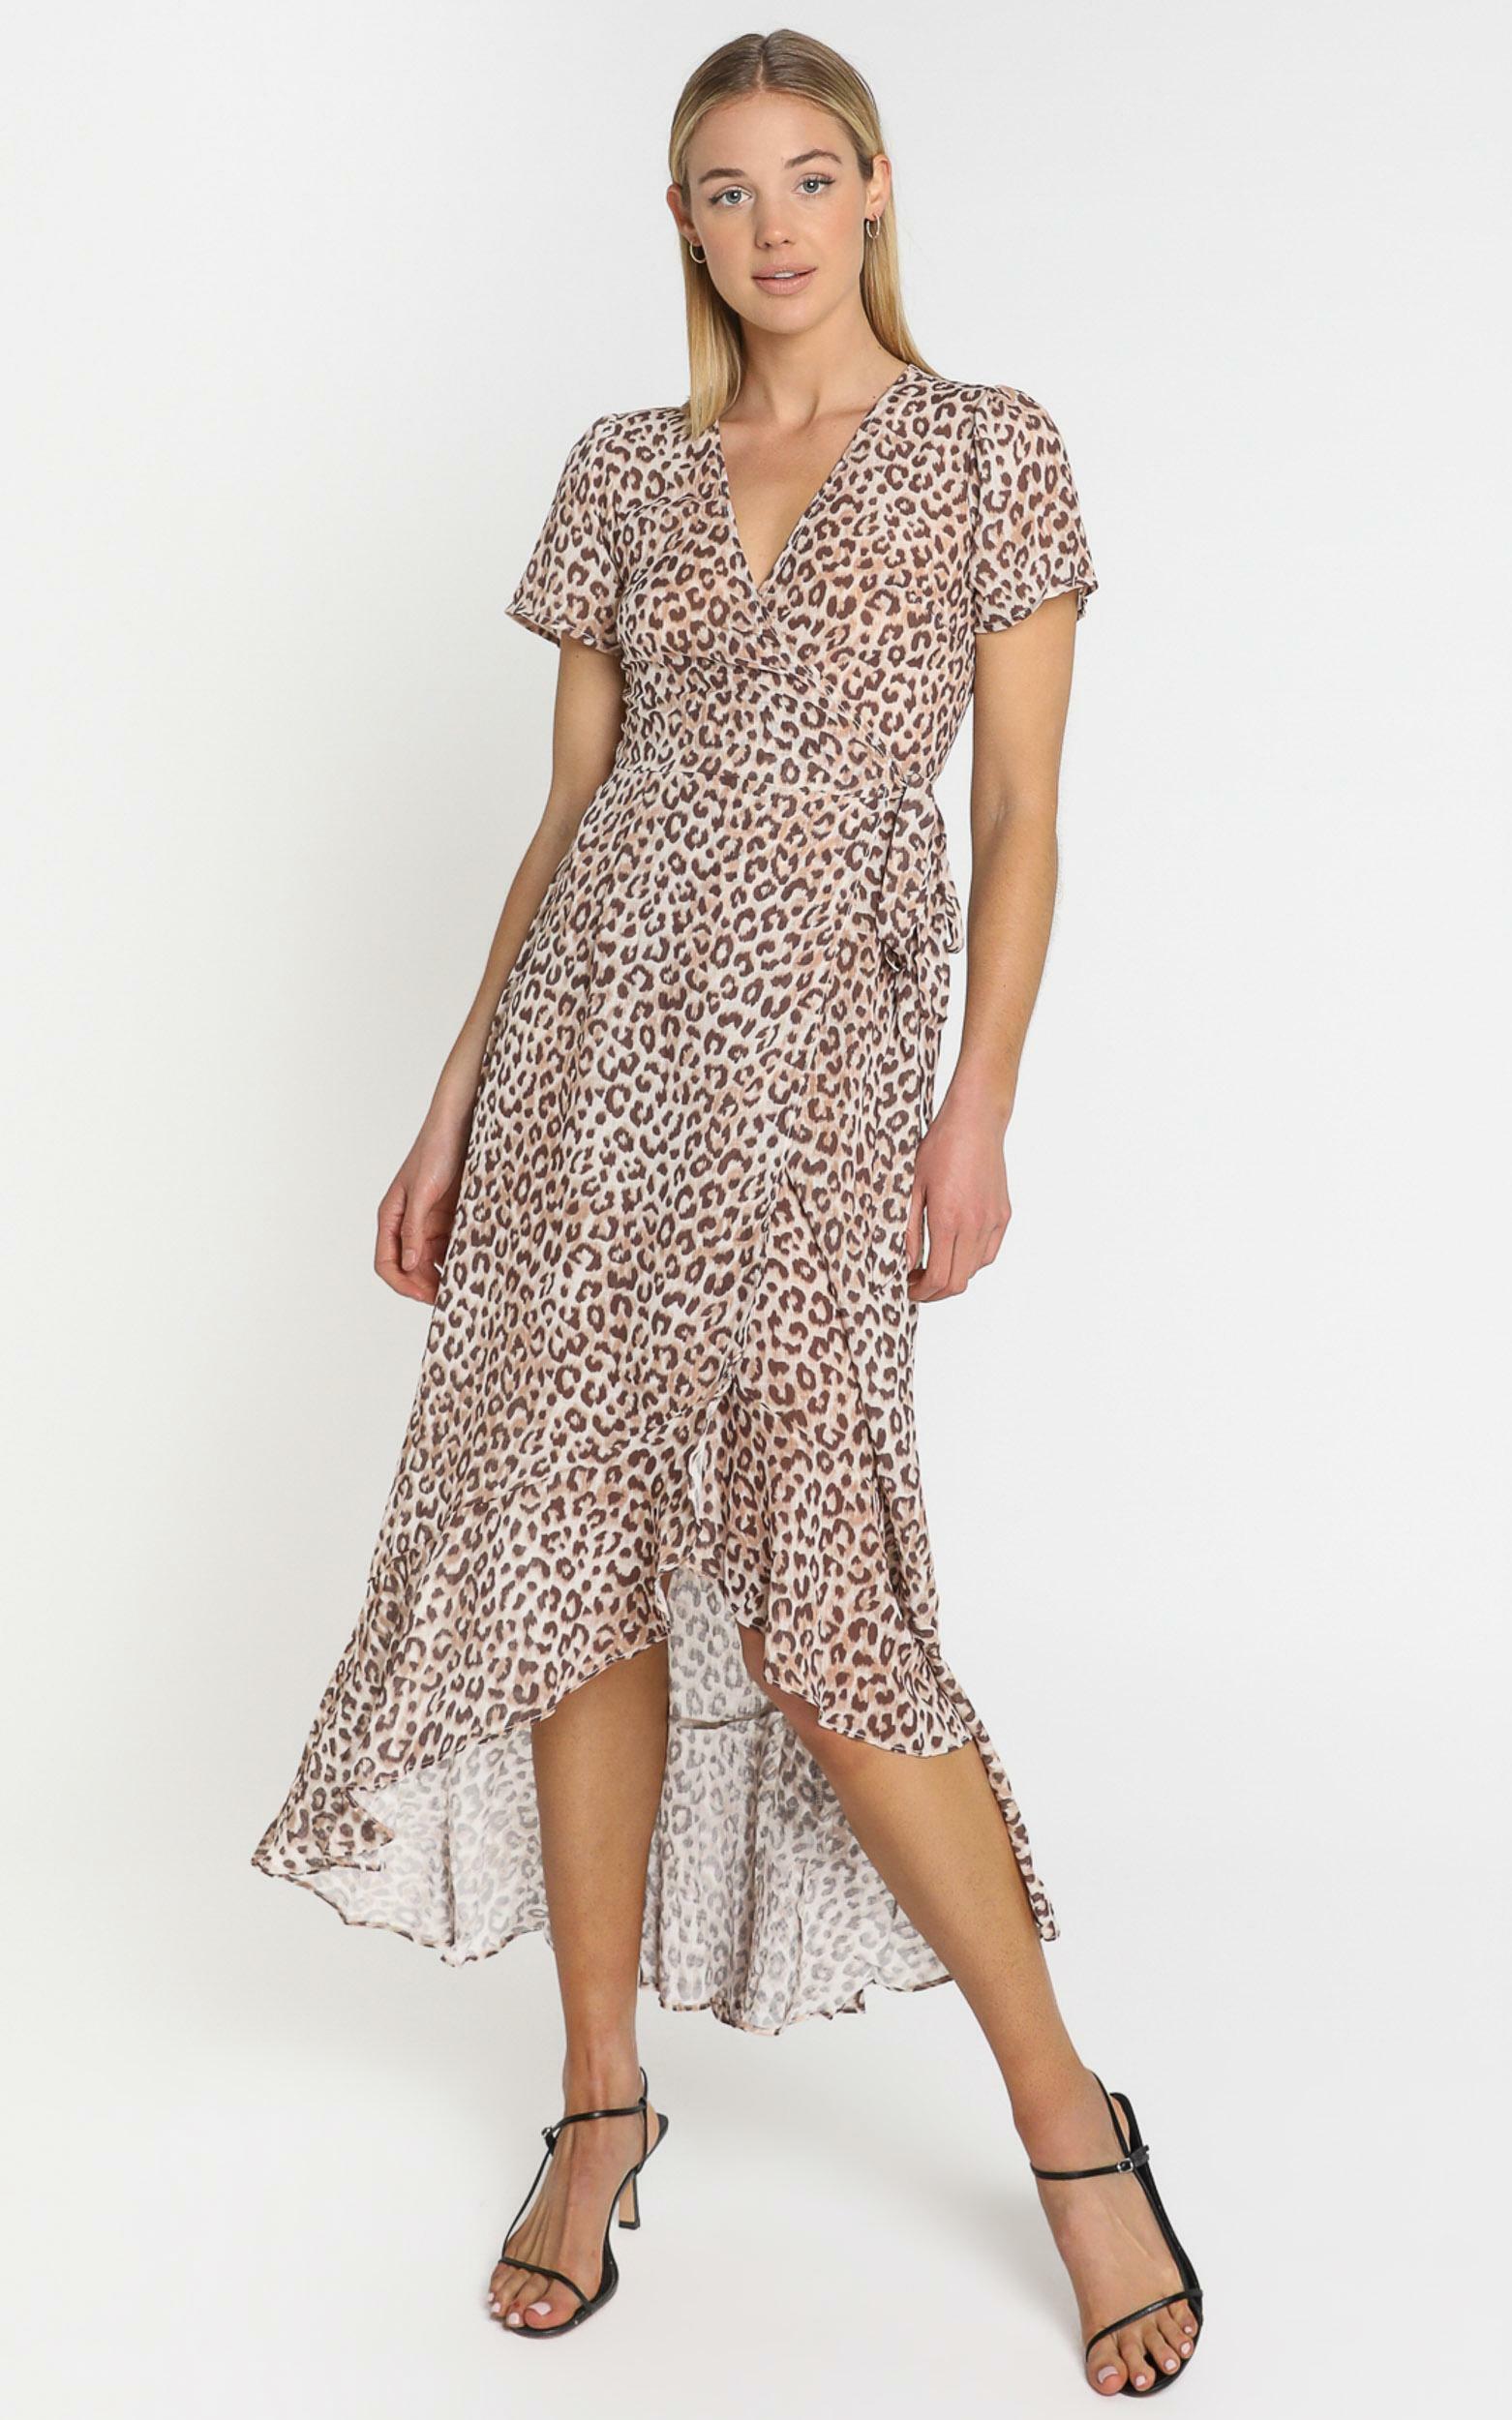 Malika Dress in Leopard Print - 6 (XS), Tan, hi-res image number null